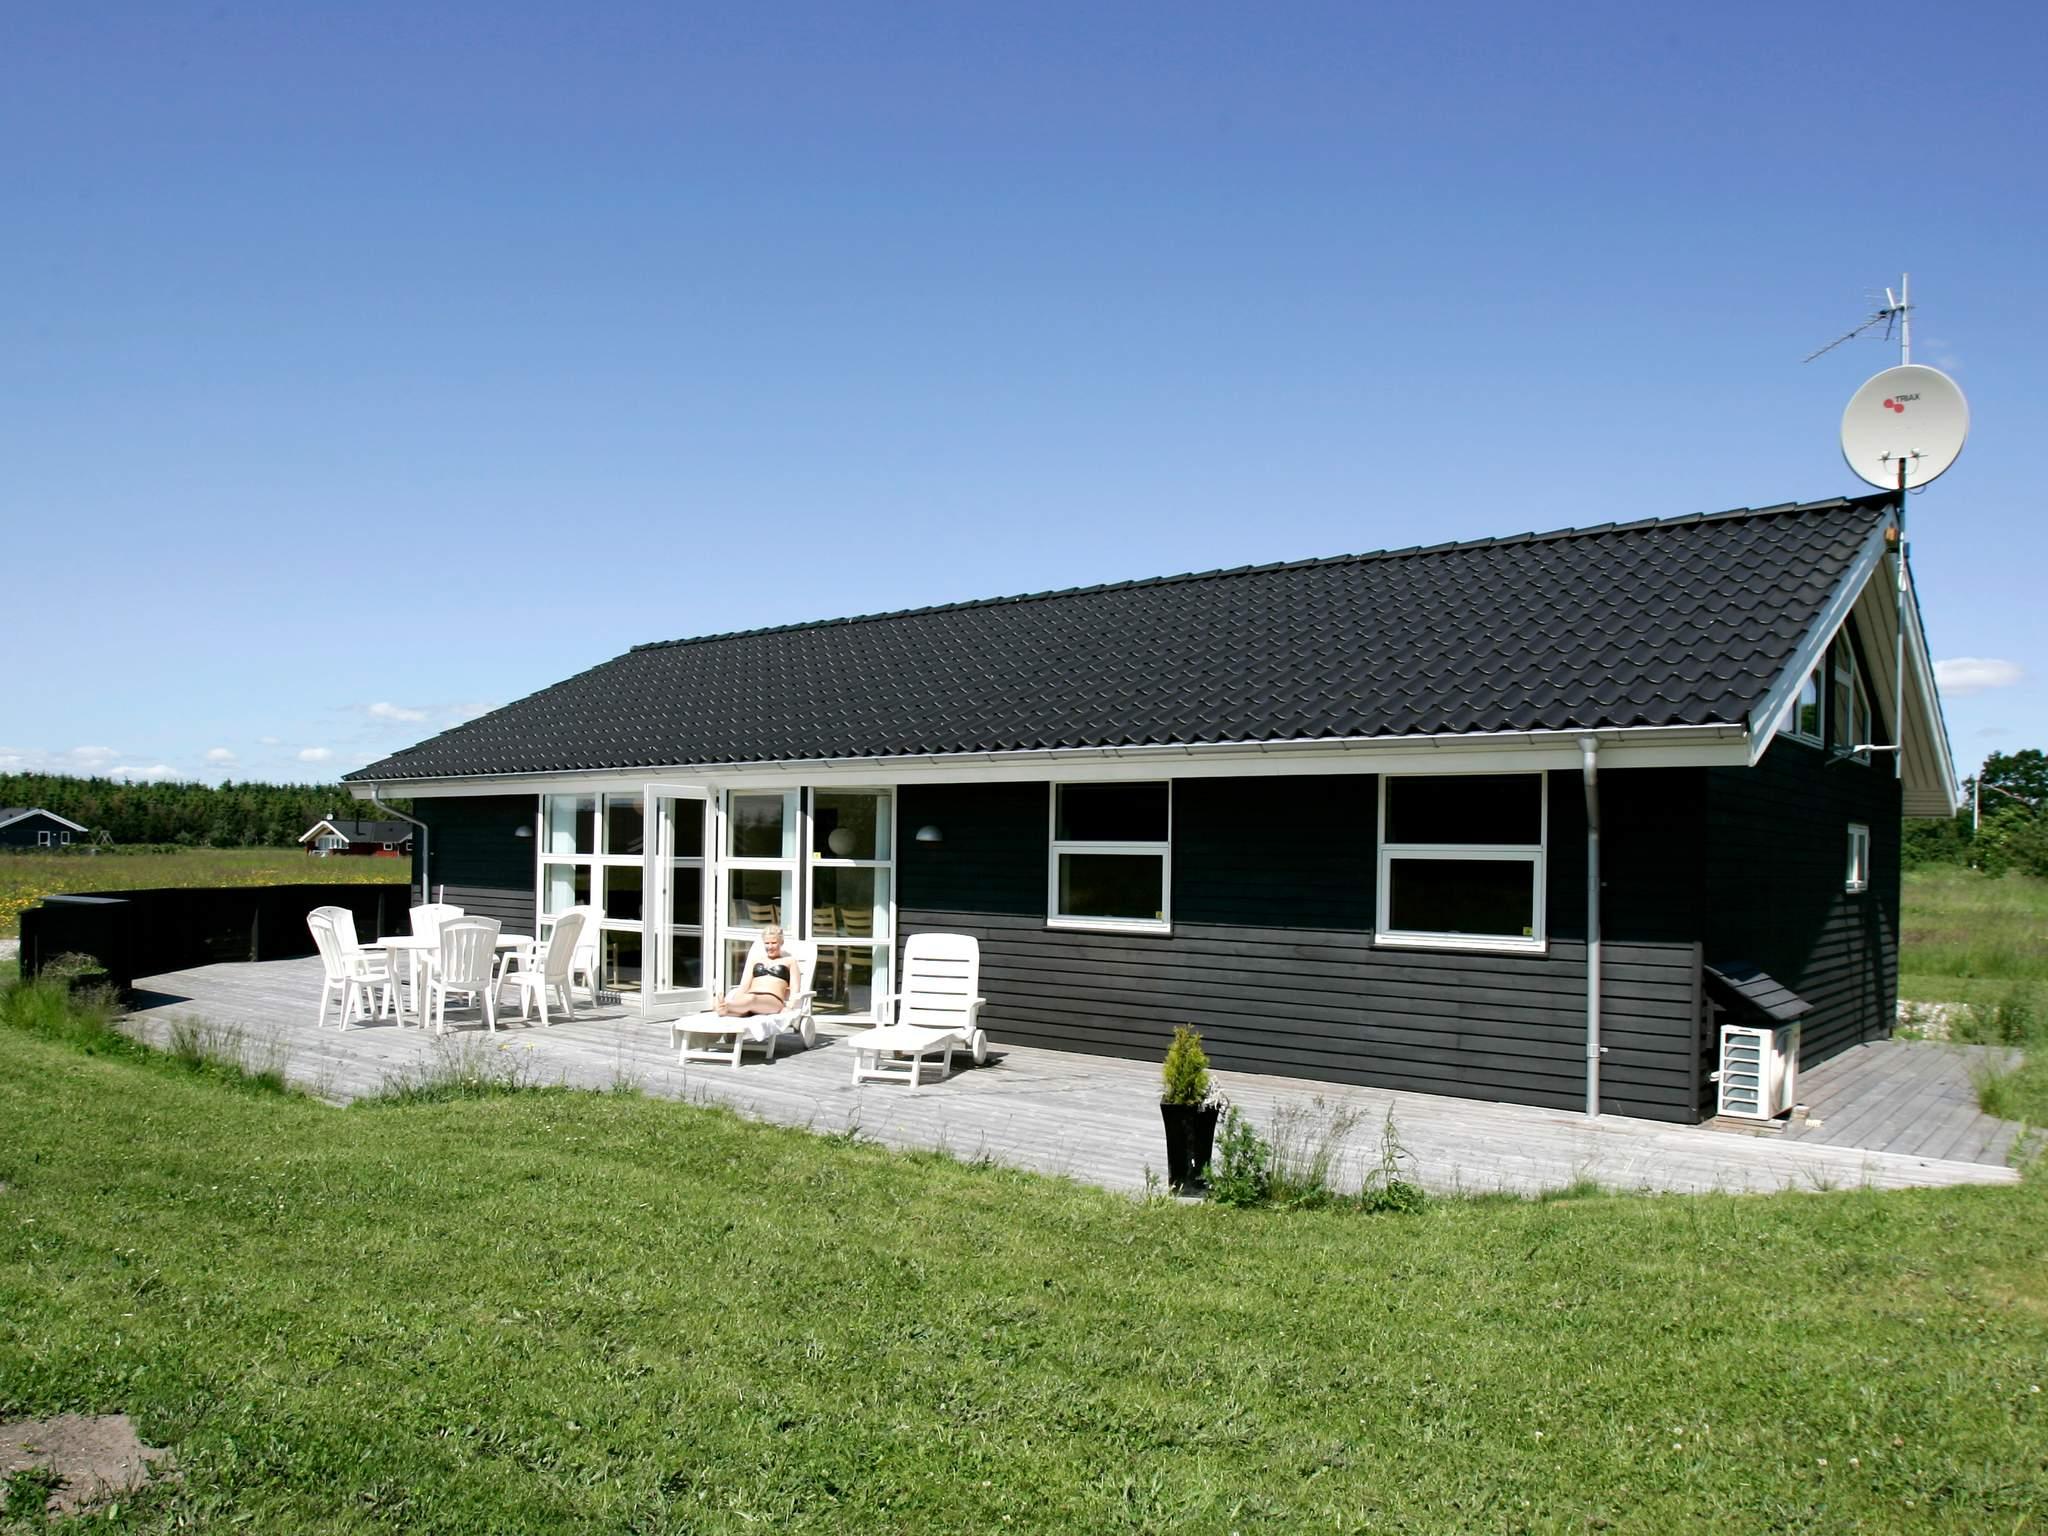 Ferienhaus Øster Hurup (487406), Øster Hurup, , Dänische Ostsee, Dänemark, Bild 1